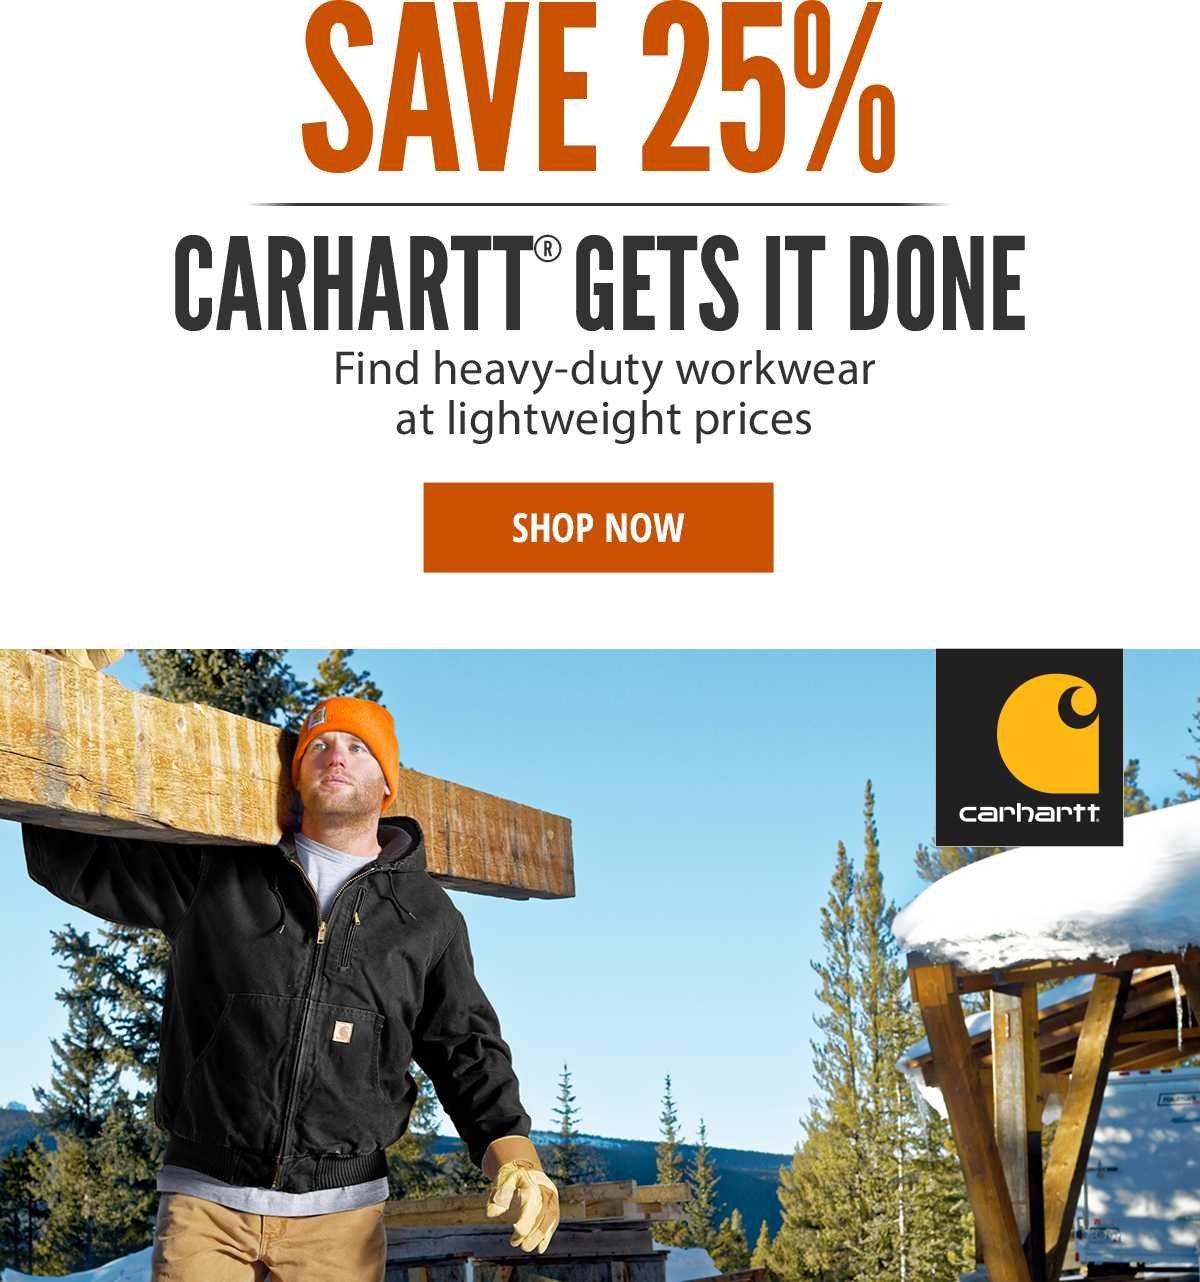 Save 25% on Select Carhartt